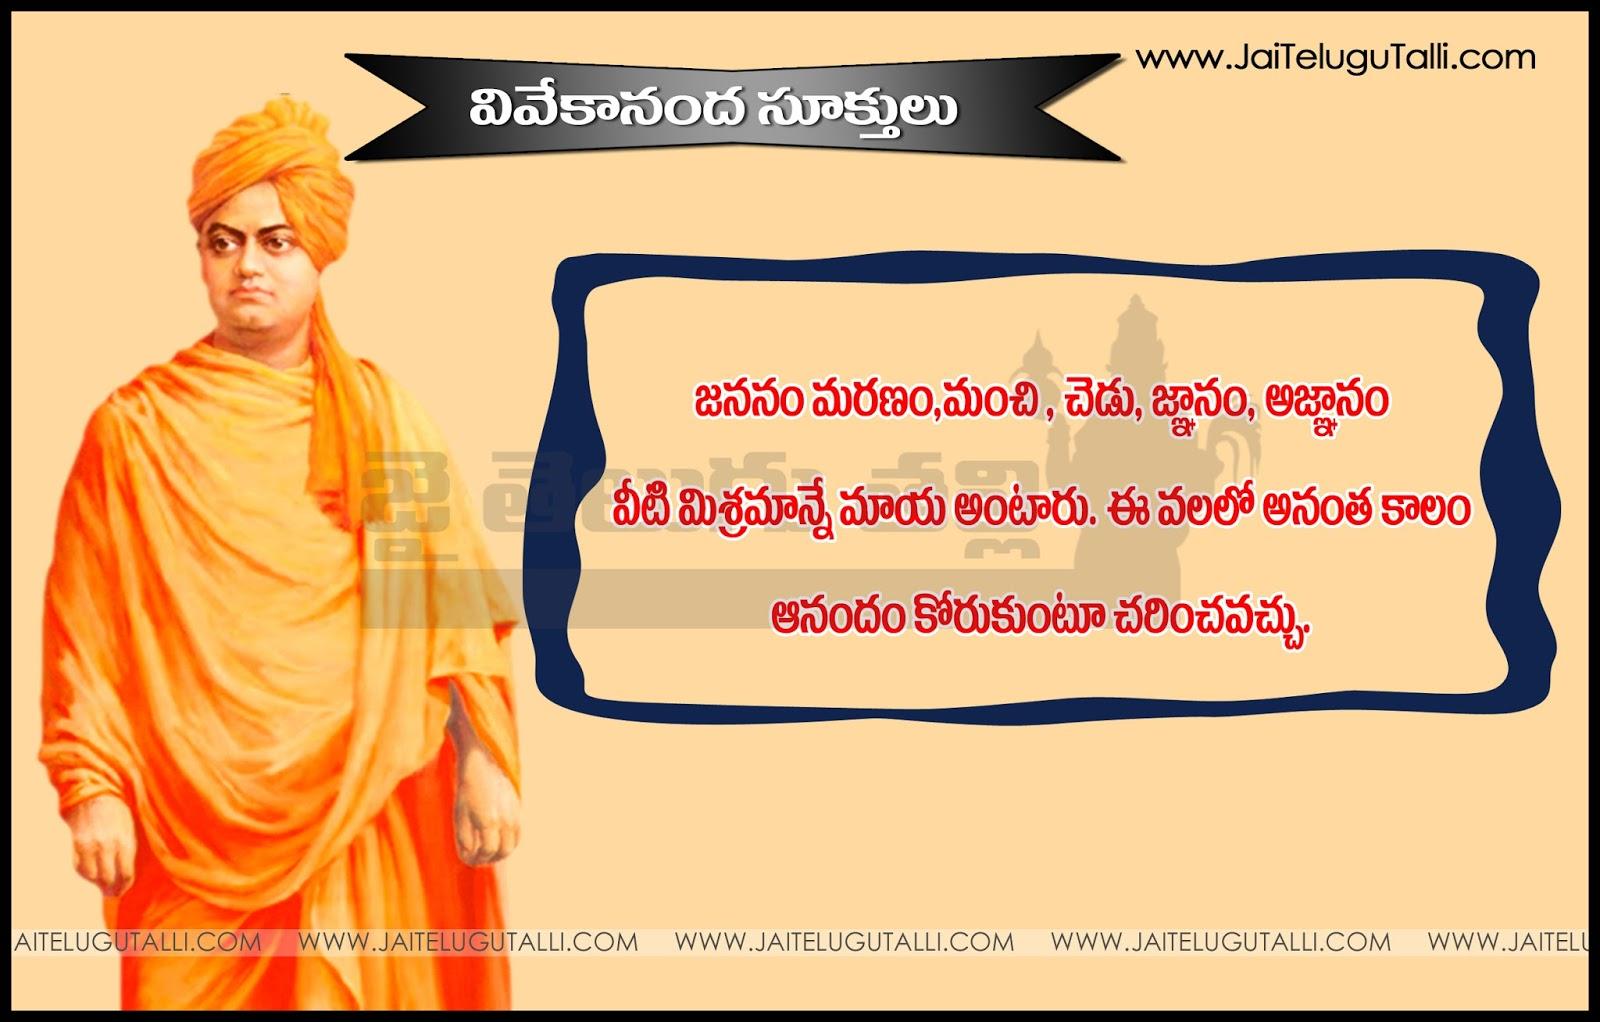 Swami Vivekananda Life Quotes In Telugu, Swami Vivekananda - Swami Vivekananda , HD Wallpaper & Backgrounds